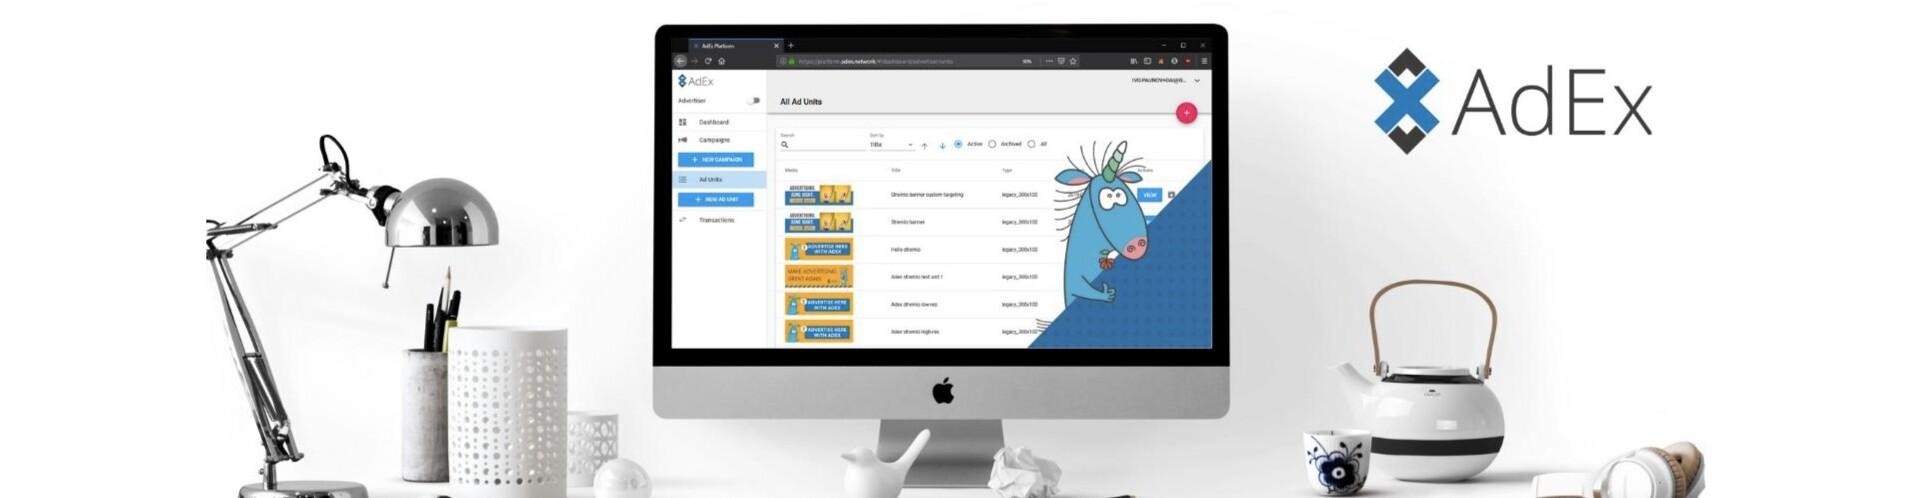 AdEx Network